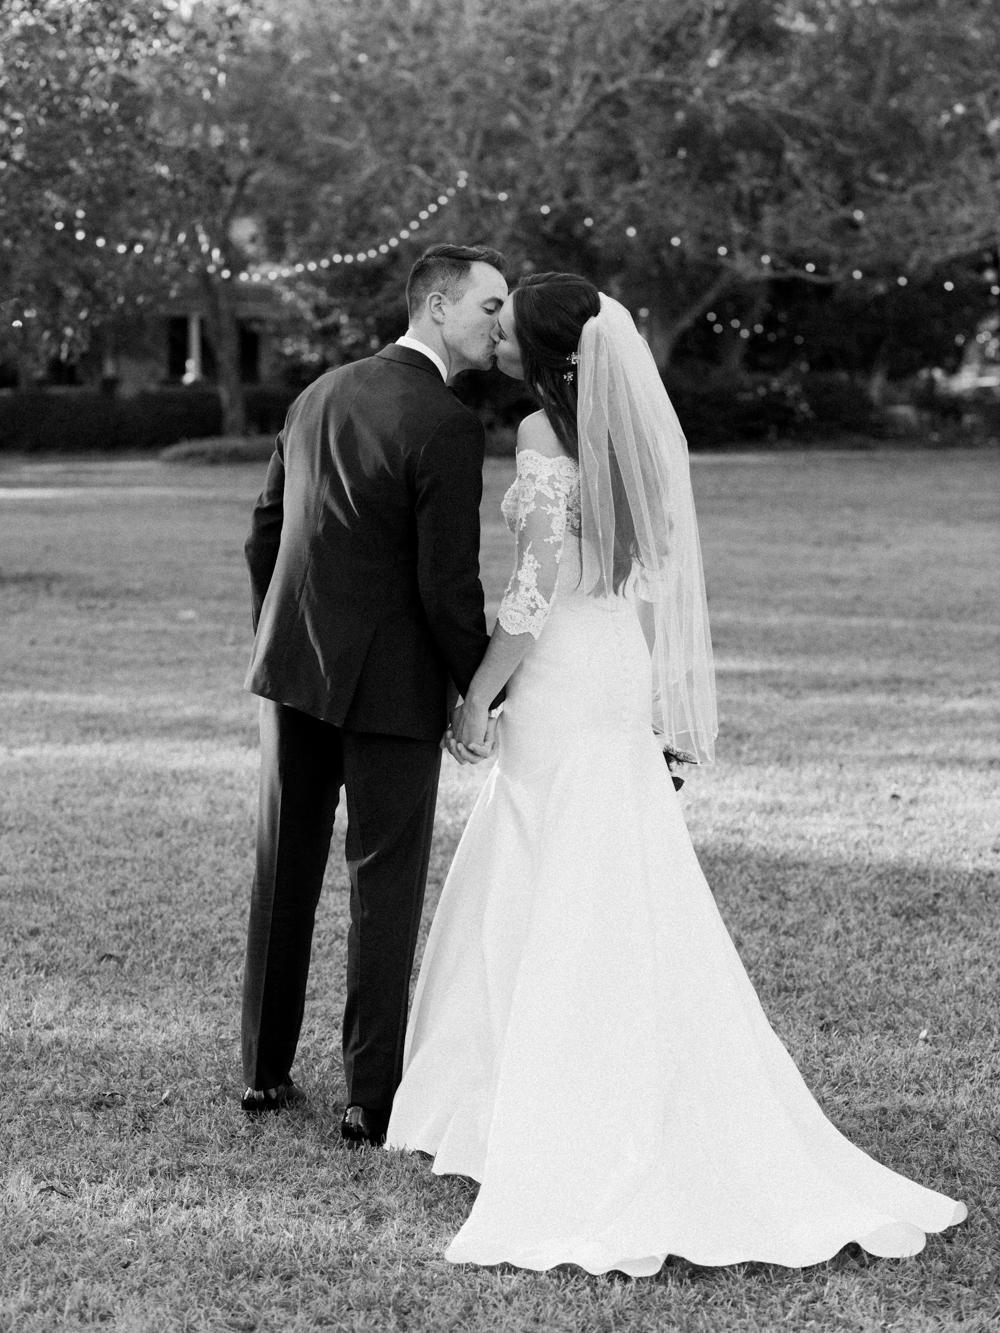 Christine Gosch - destination film photographer - houston wedding photographer - fine art film photographer - elopement photographer - destination wedding - understated wedding - simple beautiful wedding photography-145.jpg